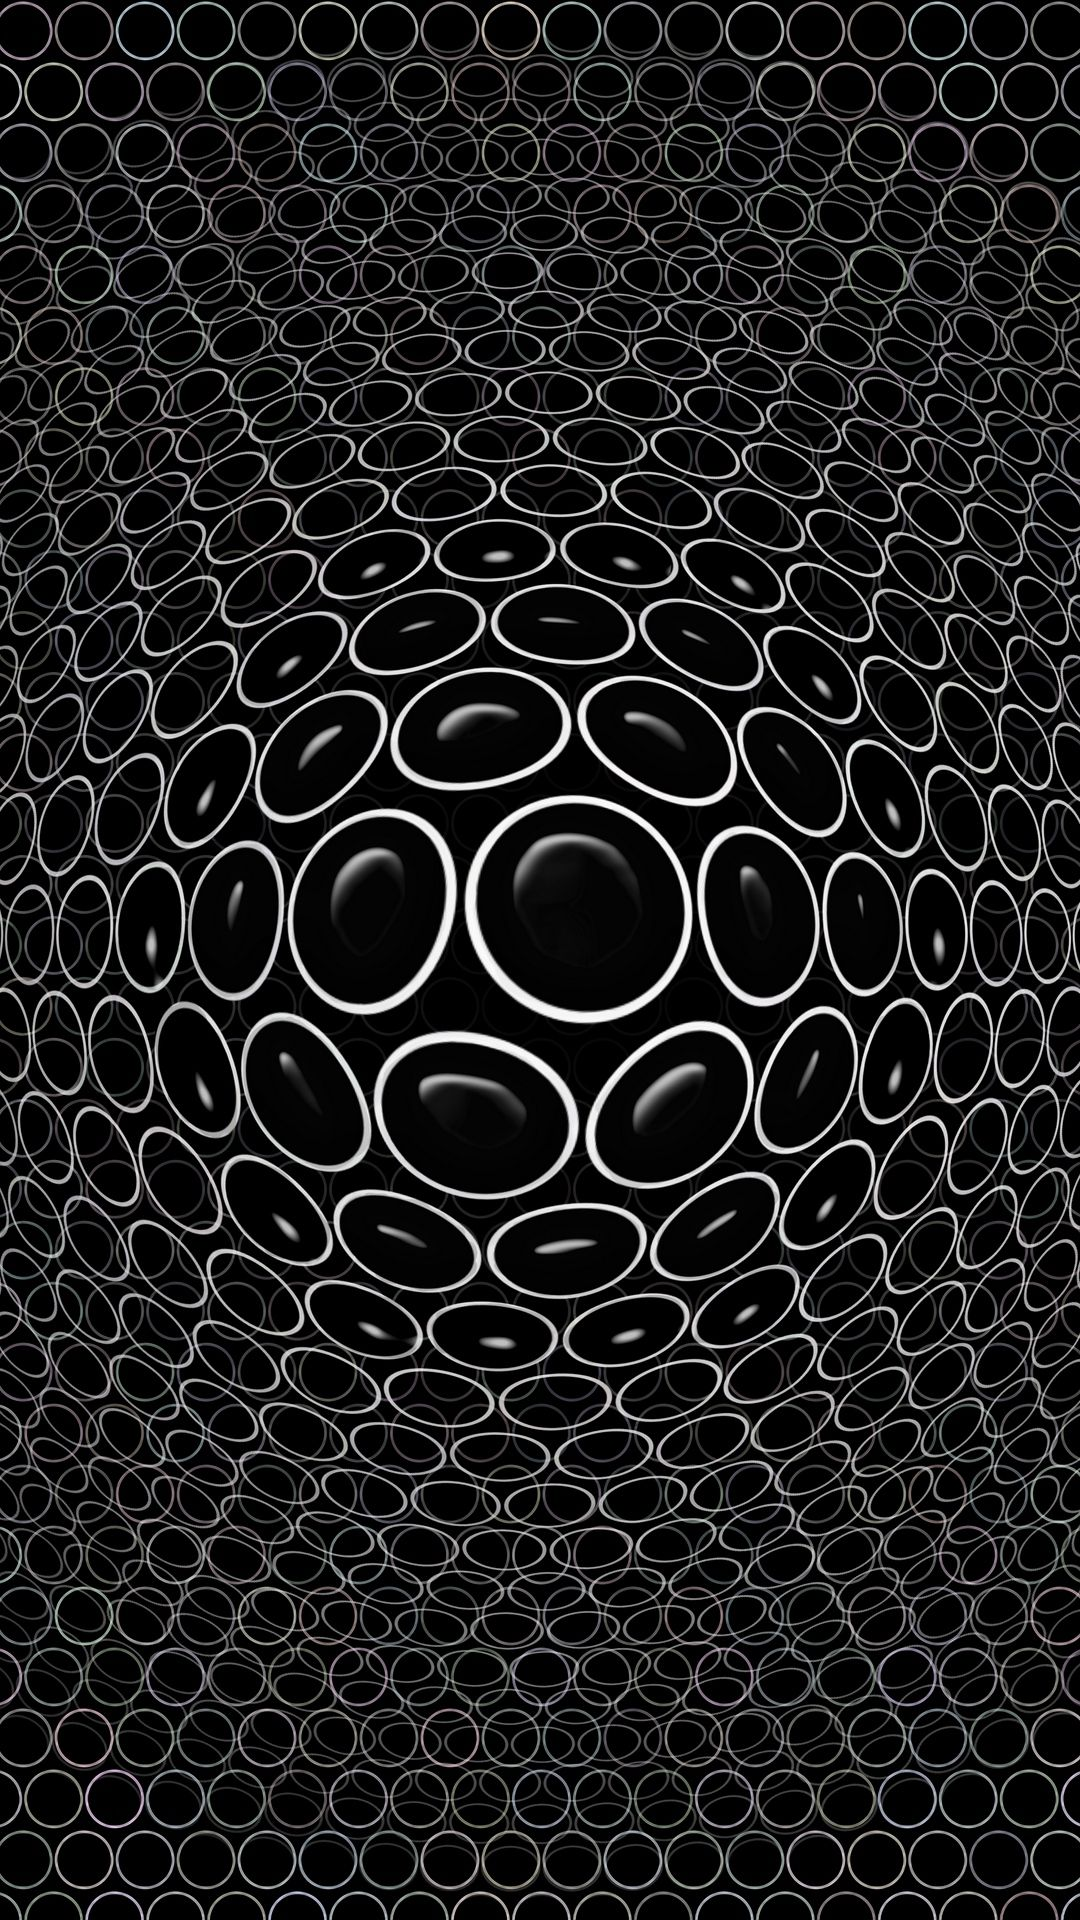 Download Convex, Embossed, Realistic, D, Circles, Black Wallpape